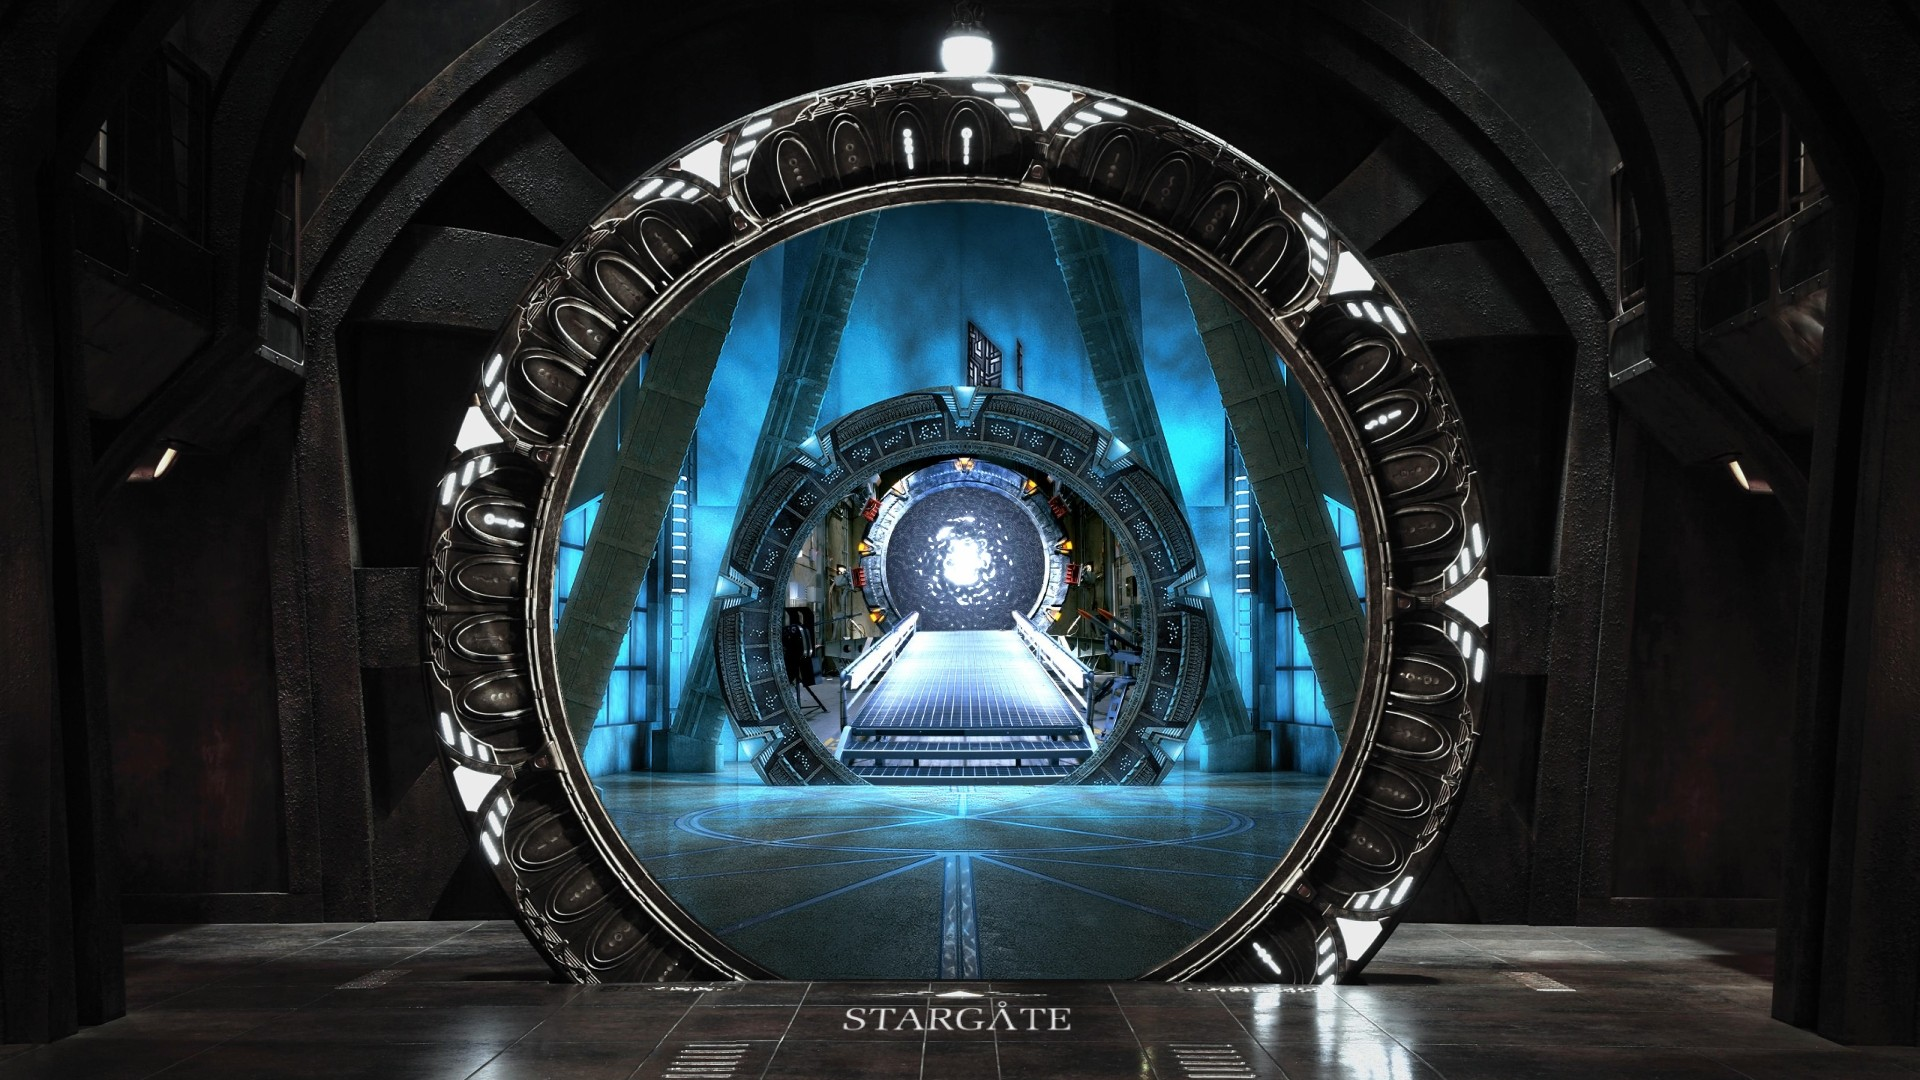 stargate wallpaper universe space - photo #28